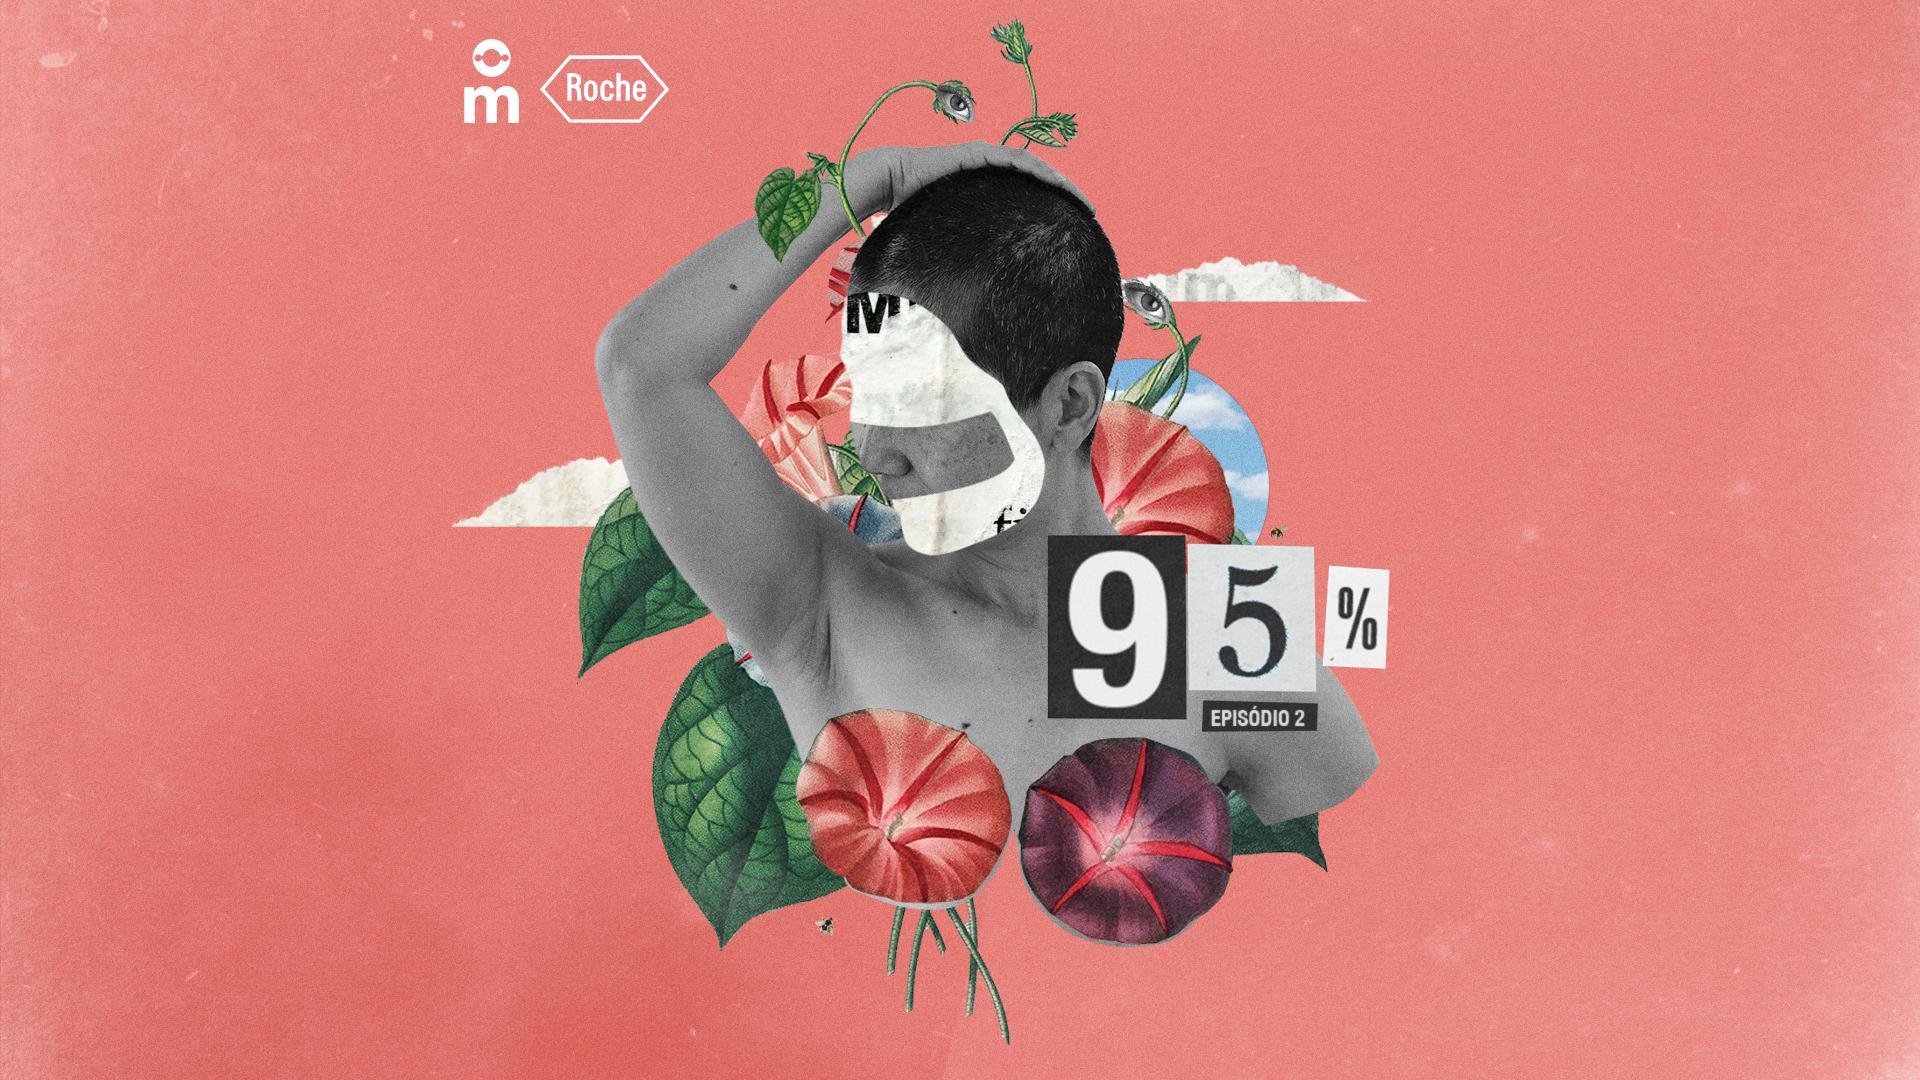 95-episodio-2